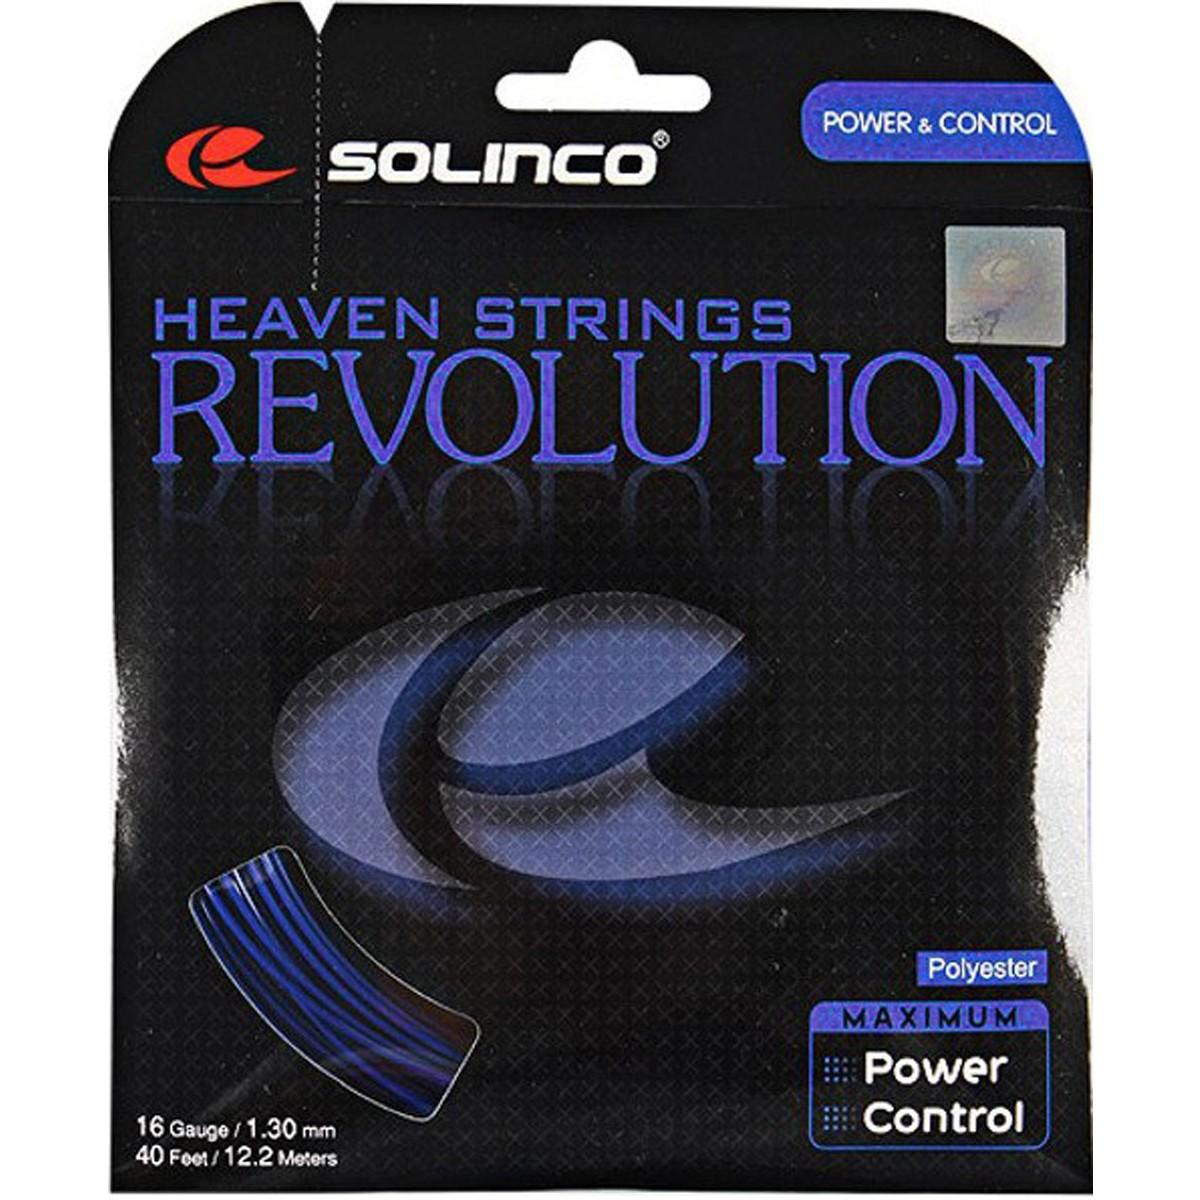 SOLINCO REVOLUTION (12 METRES) STRING PACK